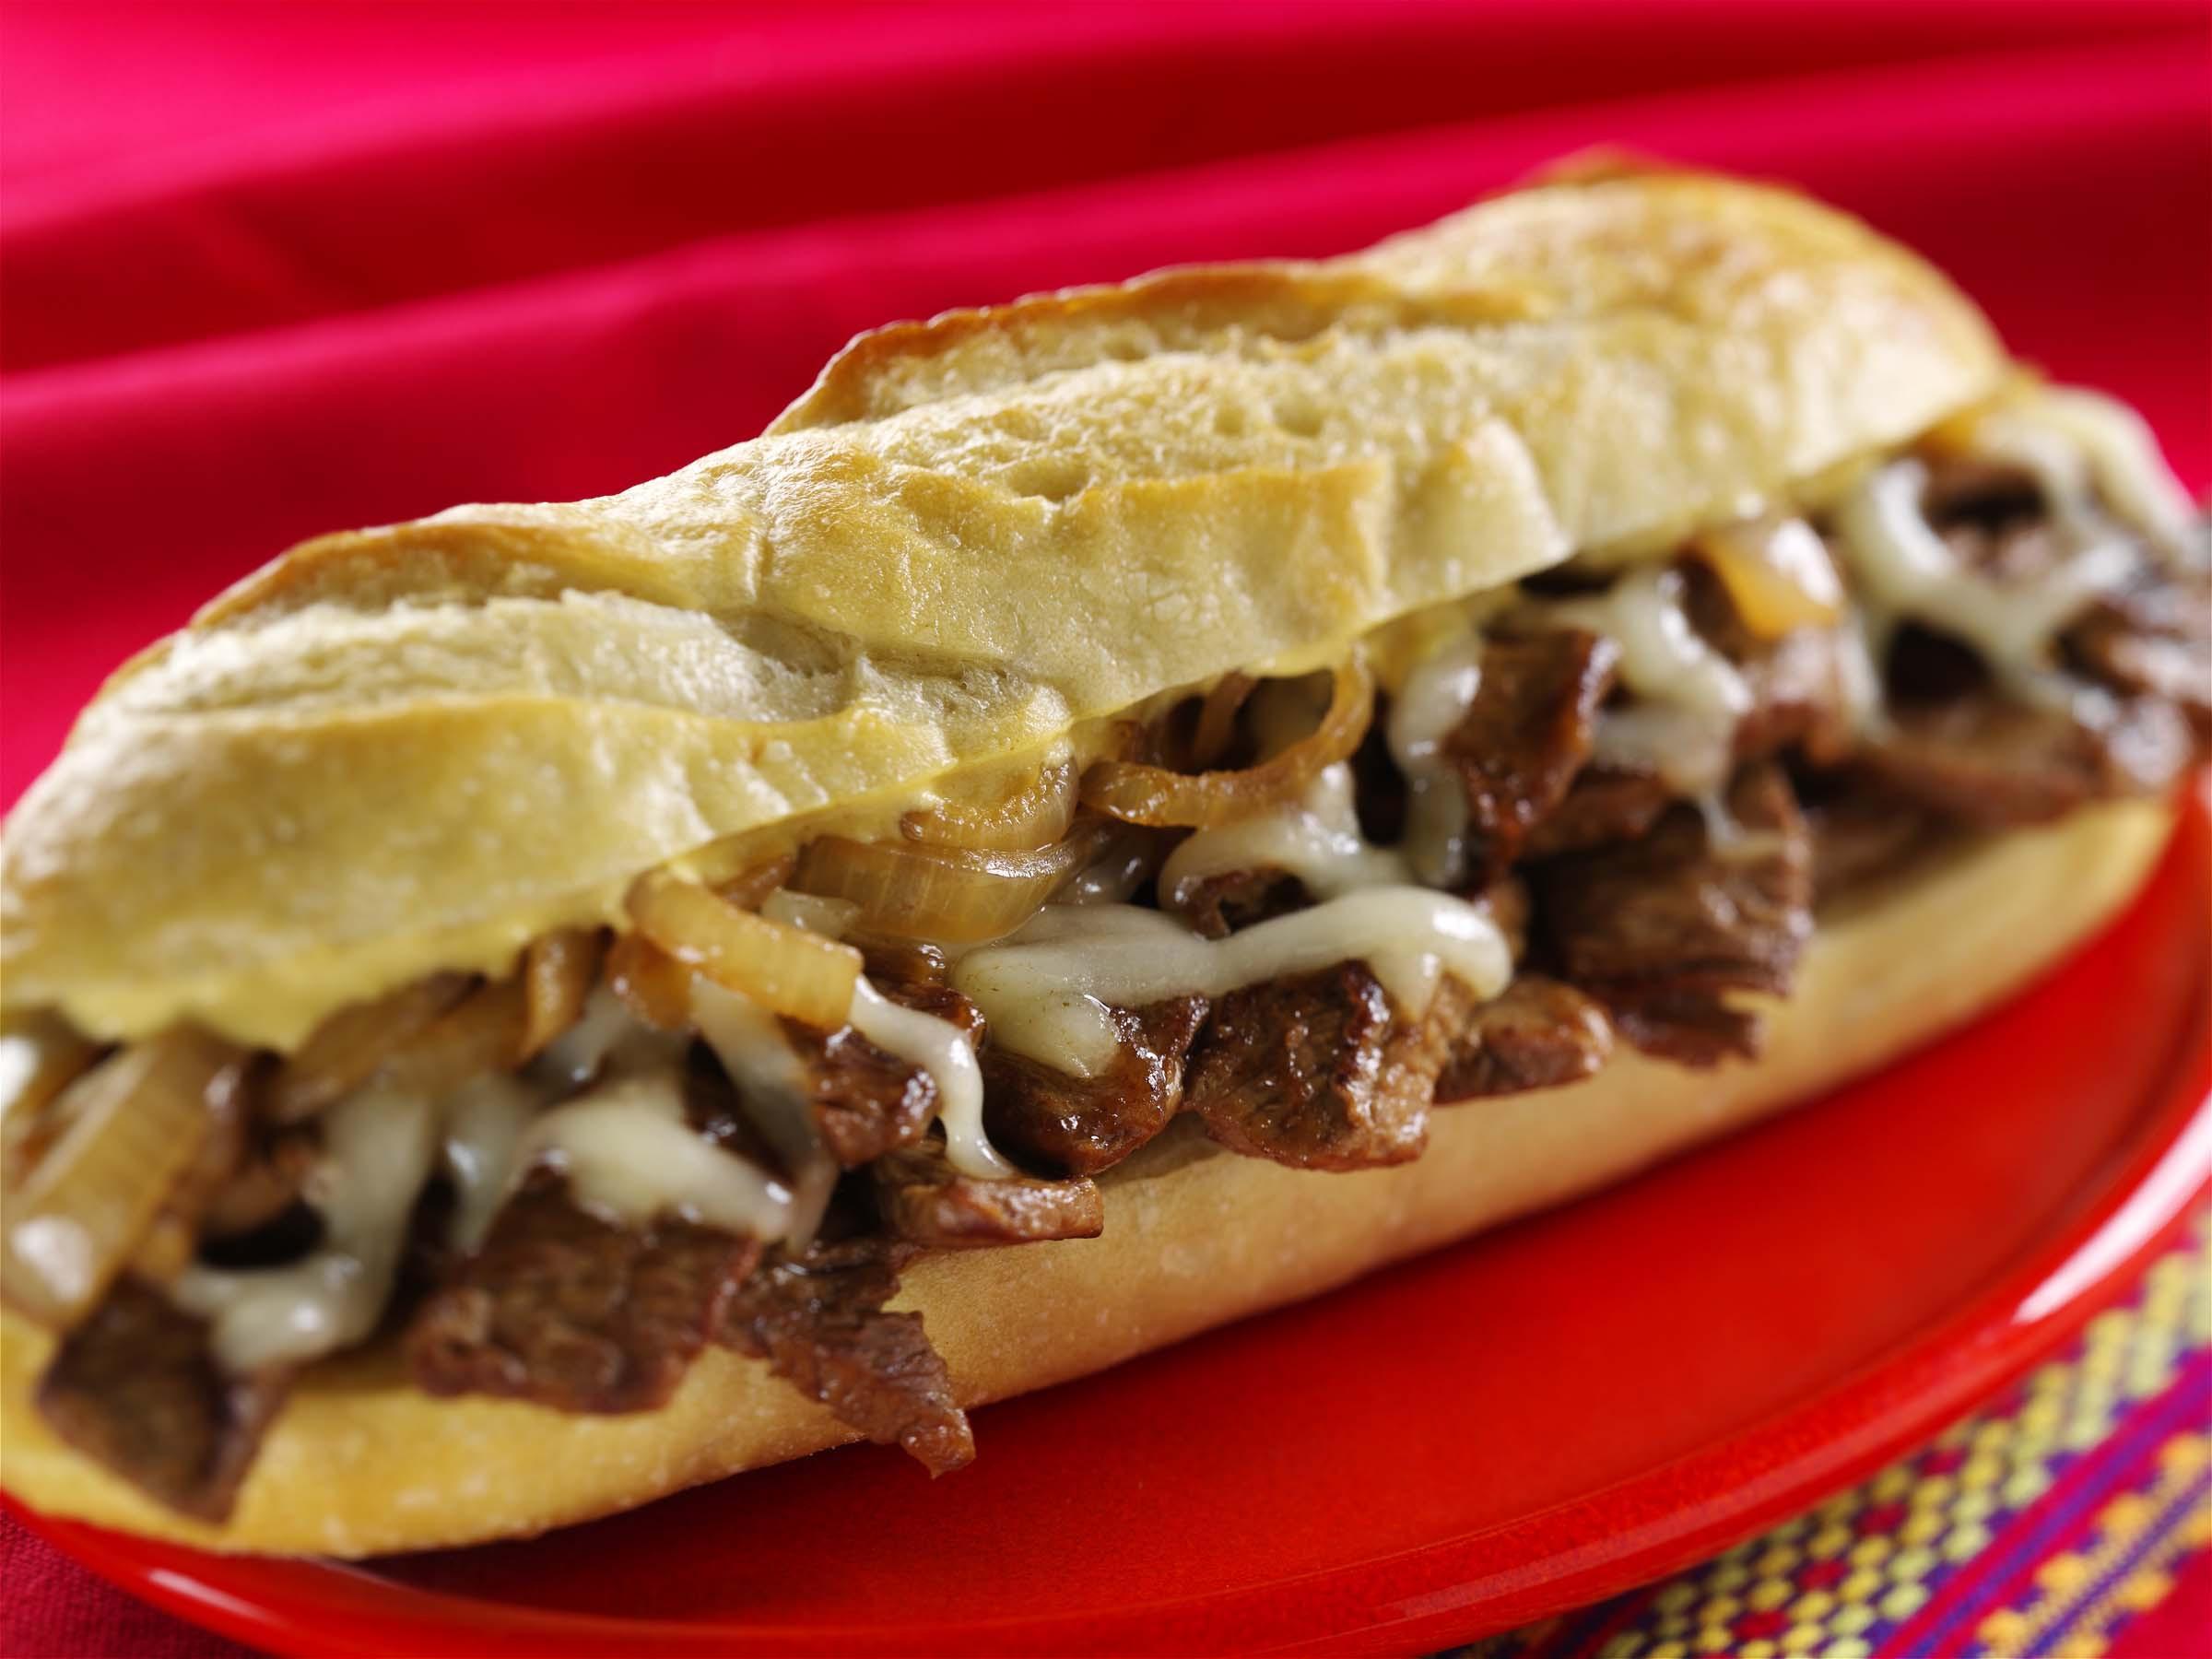 Steak And Cheese Sandwiches  Philly Cheesesteak Sandwich Wisconsin Farm Bureau Federation